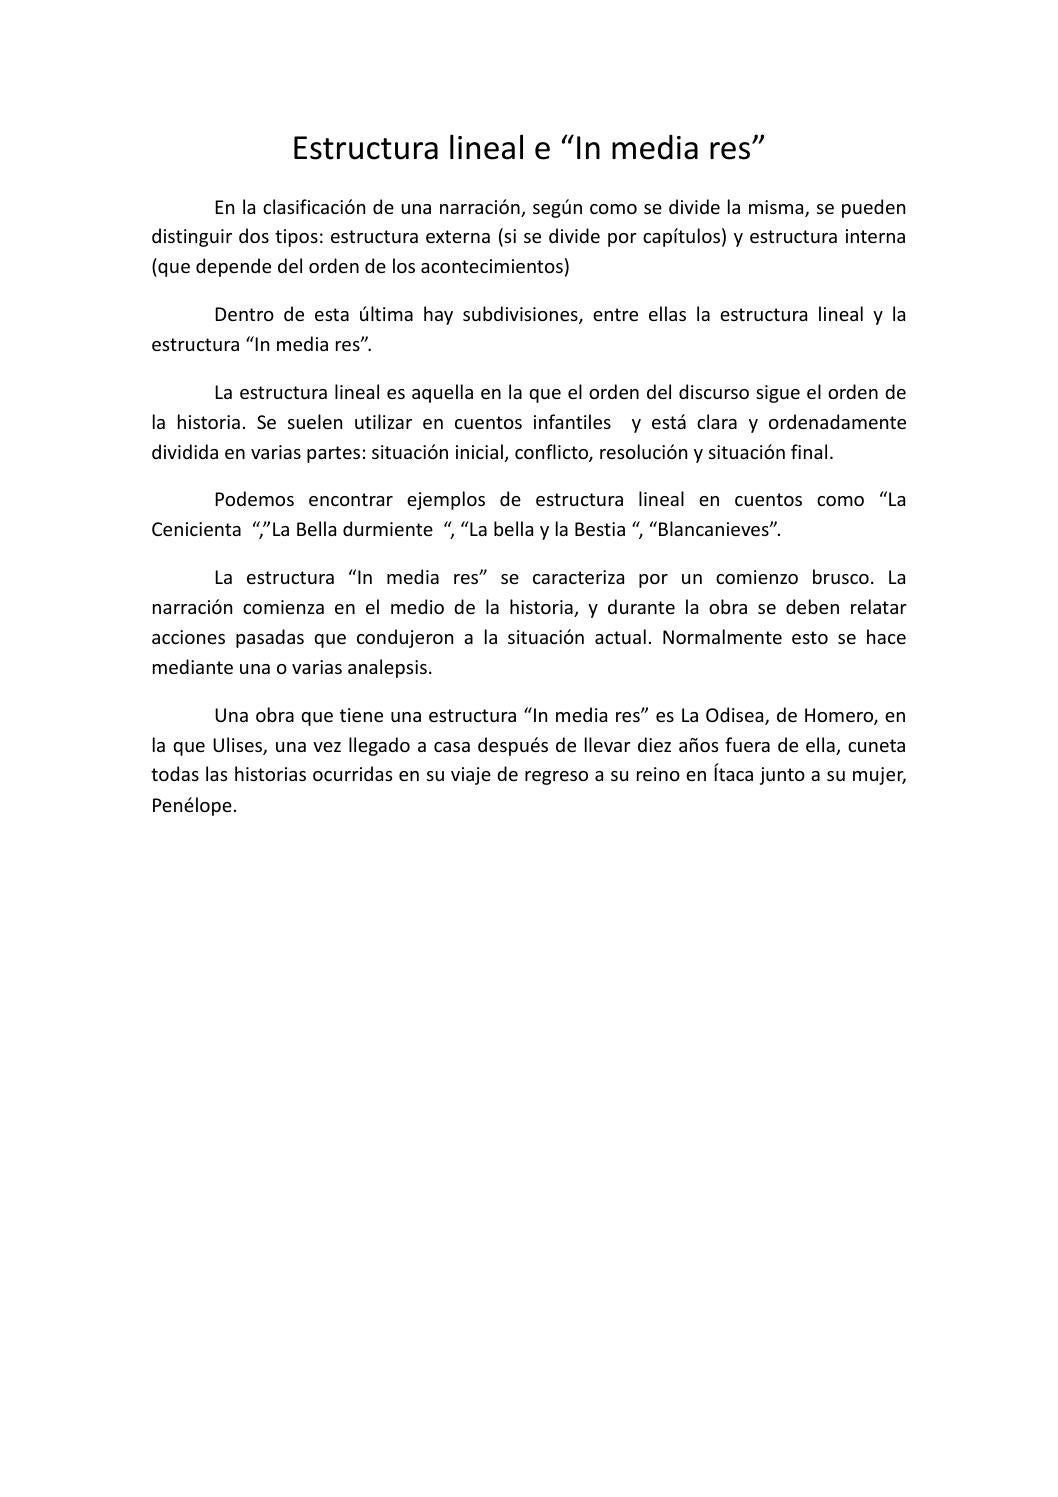 Estructura Lineal E In Media Res By María Sánchez Manteiga